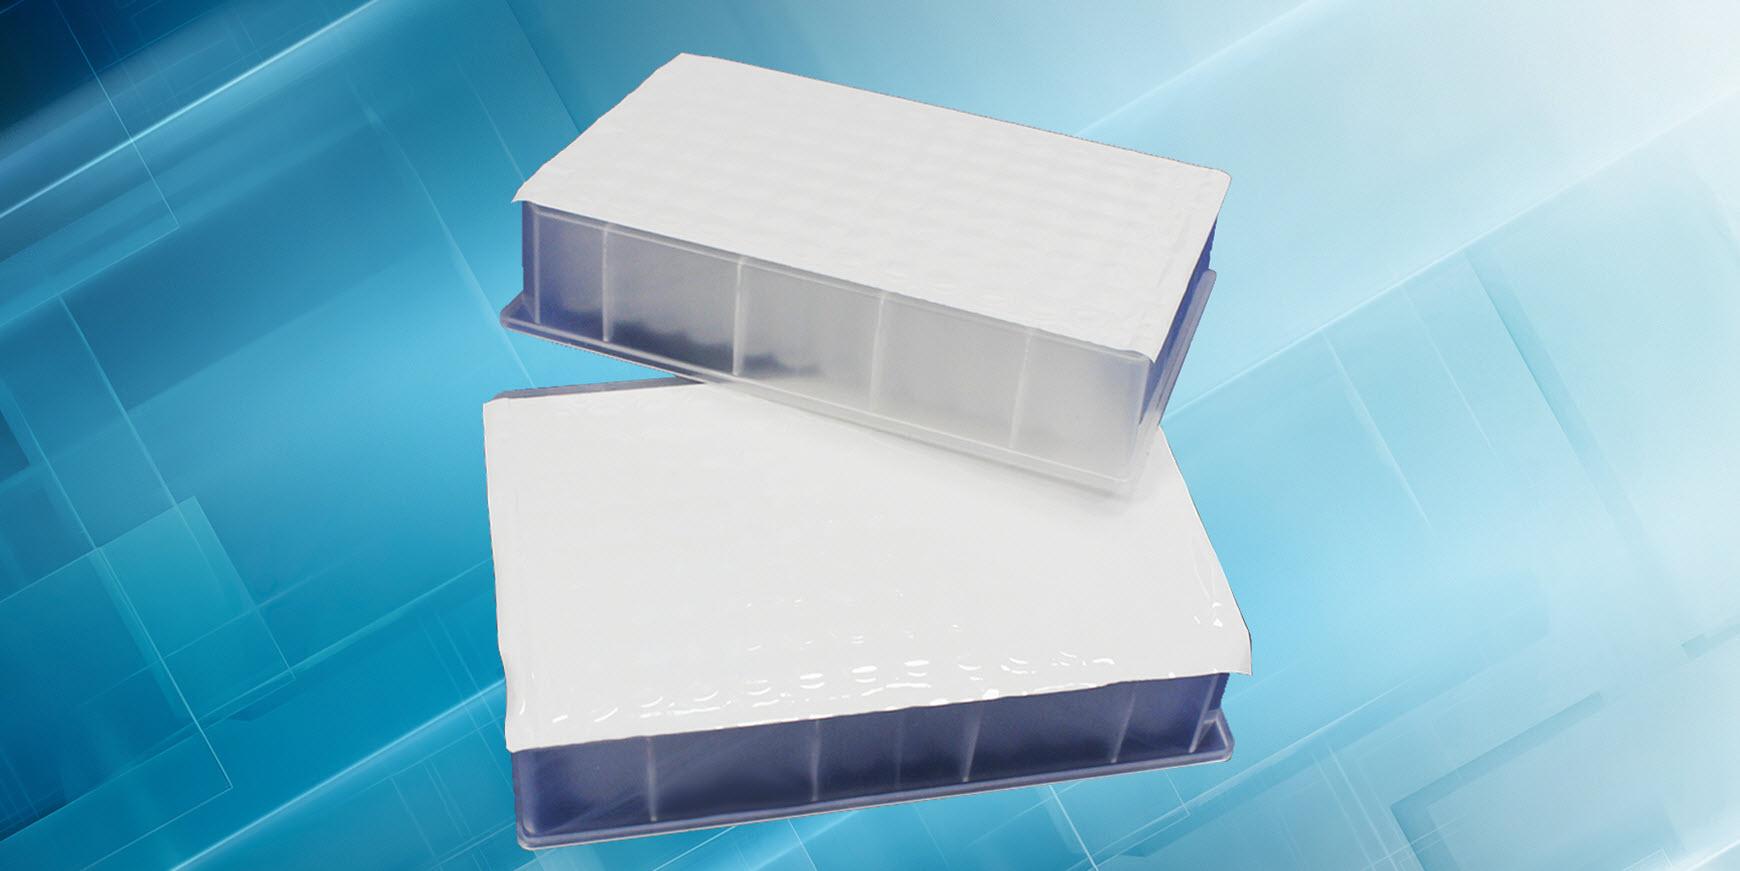 An Extensive Range of High Integrity Microplate Heat Sealing Films